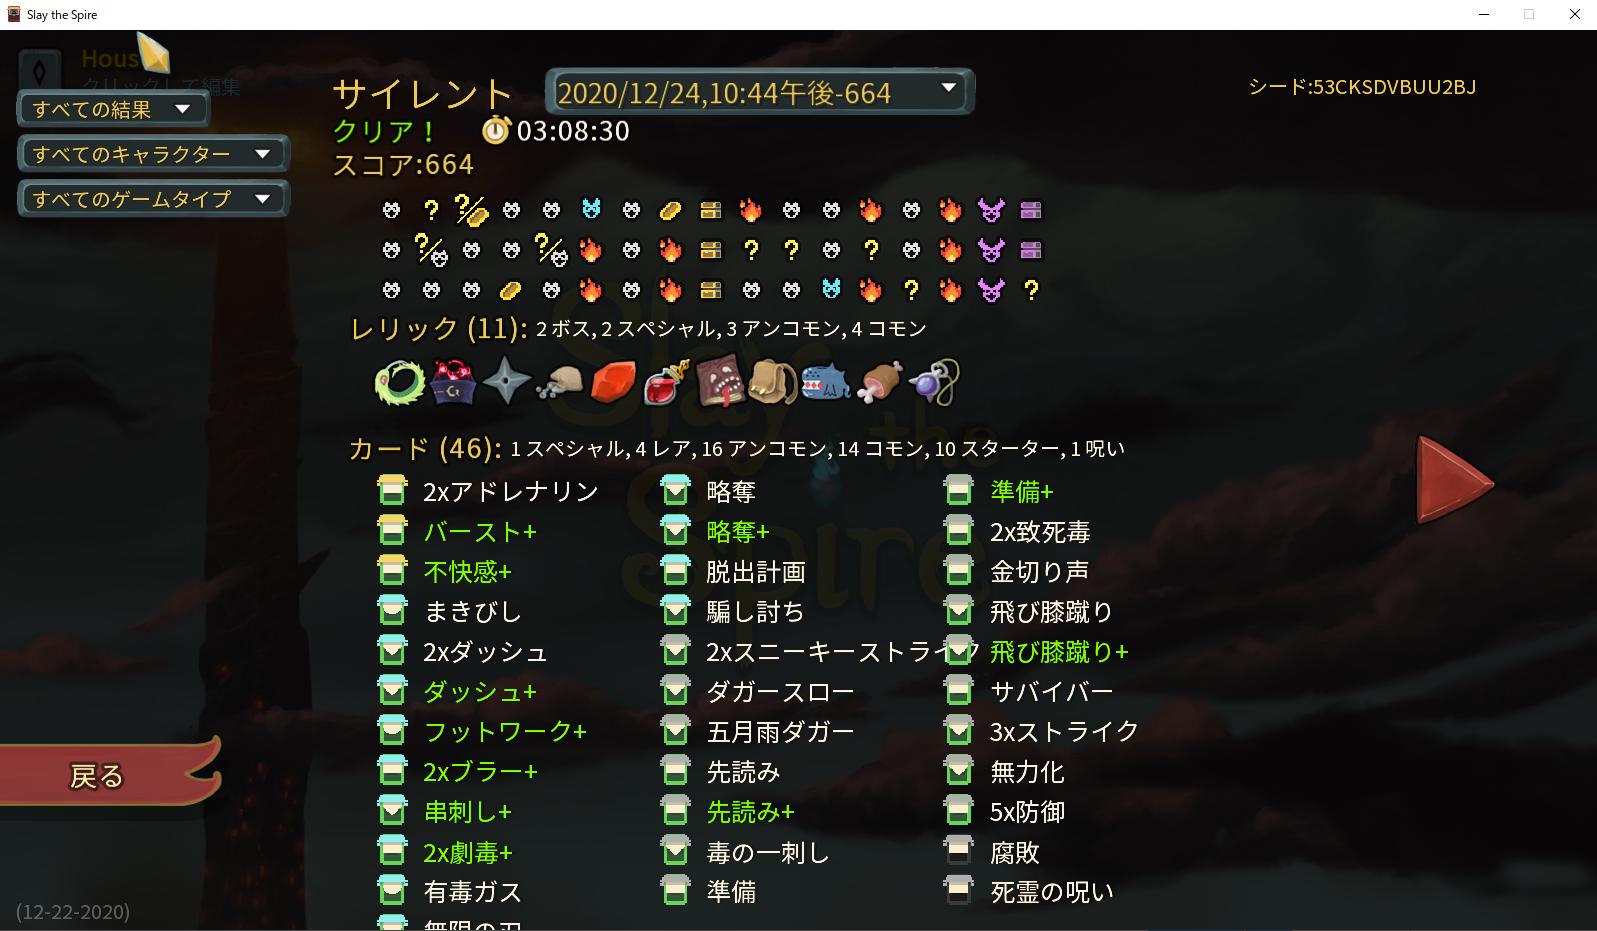 f:id:himajin-mode:20201224224909p:plain